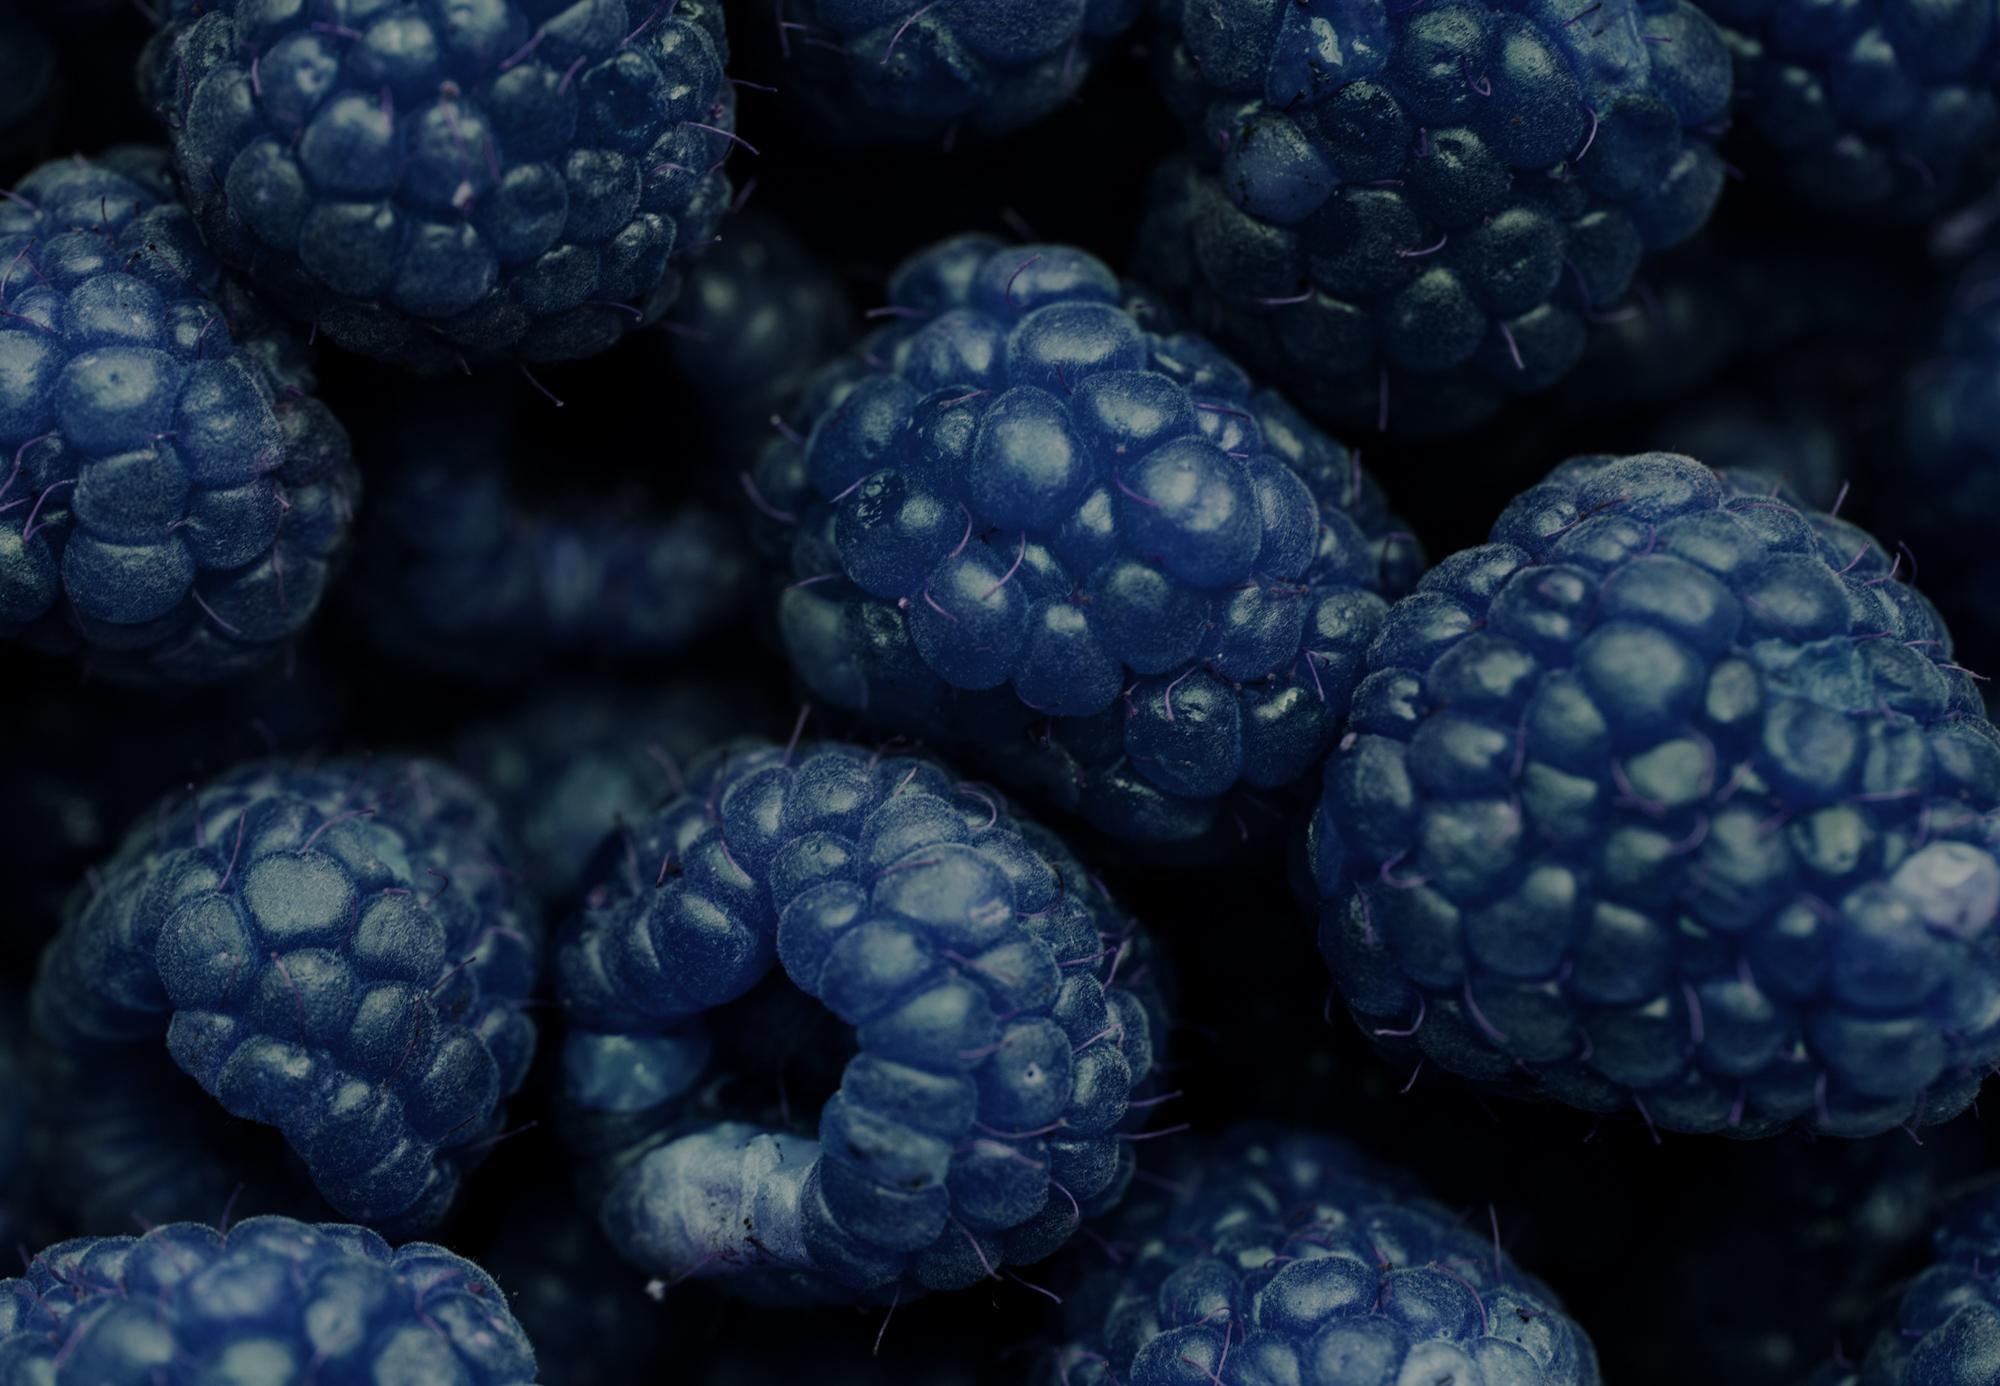 free images background, berry, blackberry, blue, closeupfree images background, berry, blackberry, blue, closeup, delicious, dessert, detox, diet, effect, energy, food, fresh, freshness, fruit, harvest,